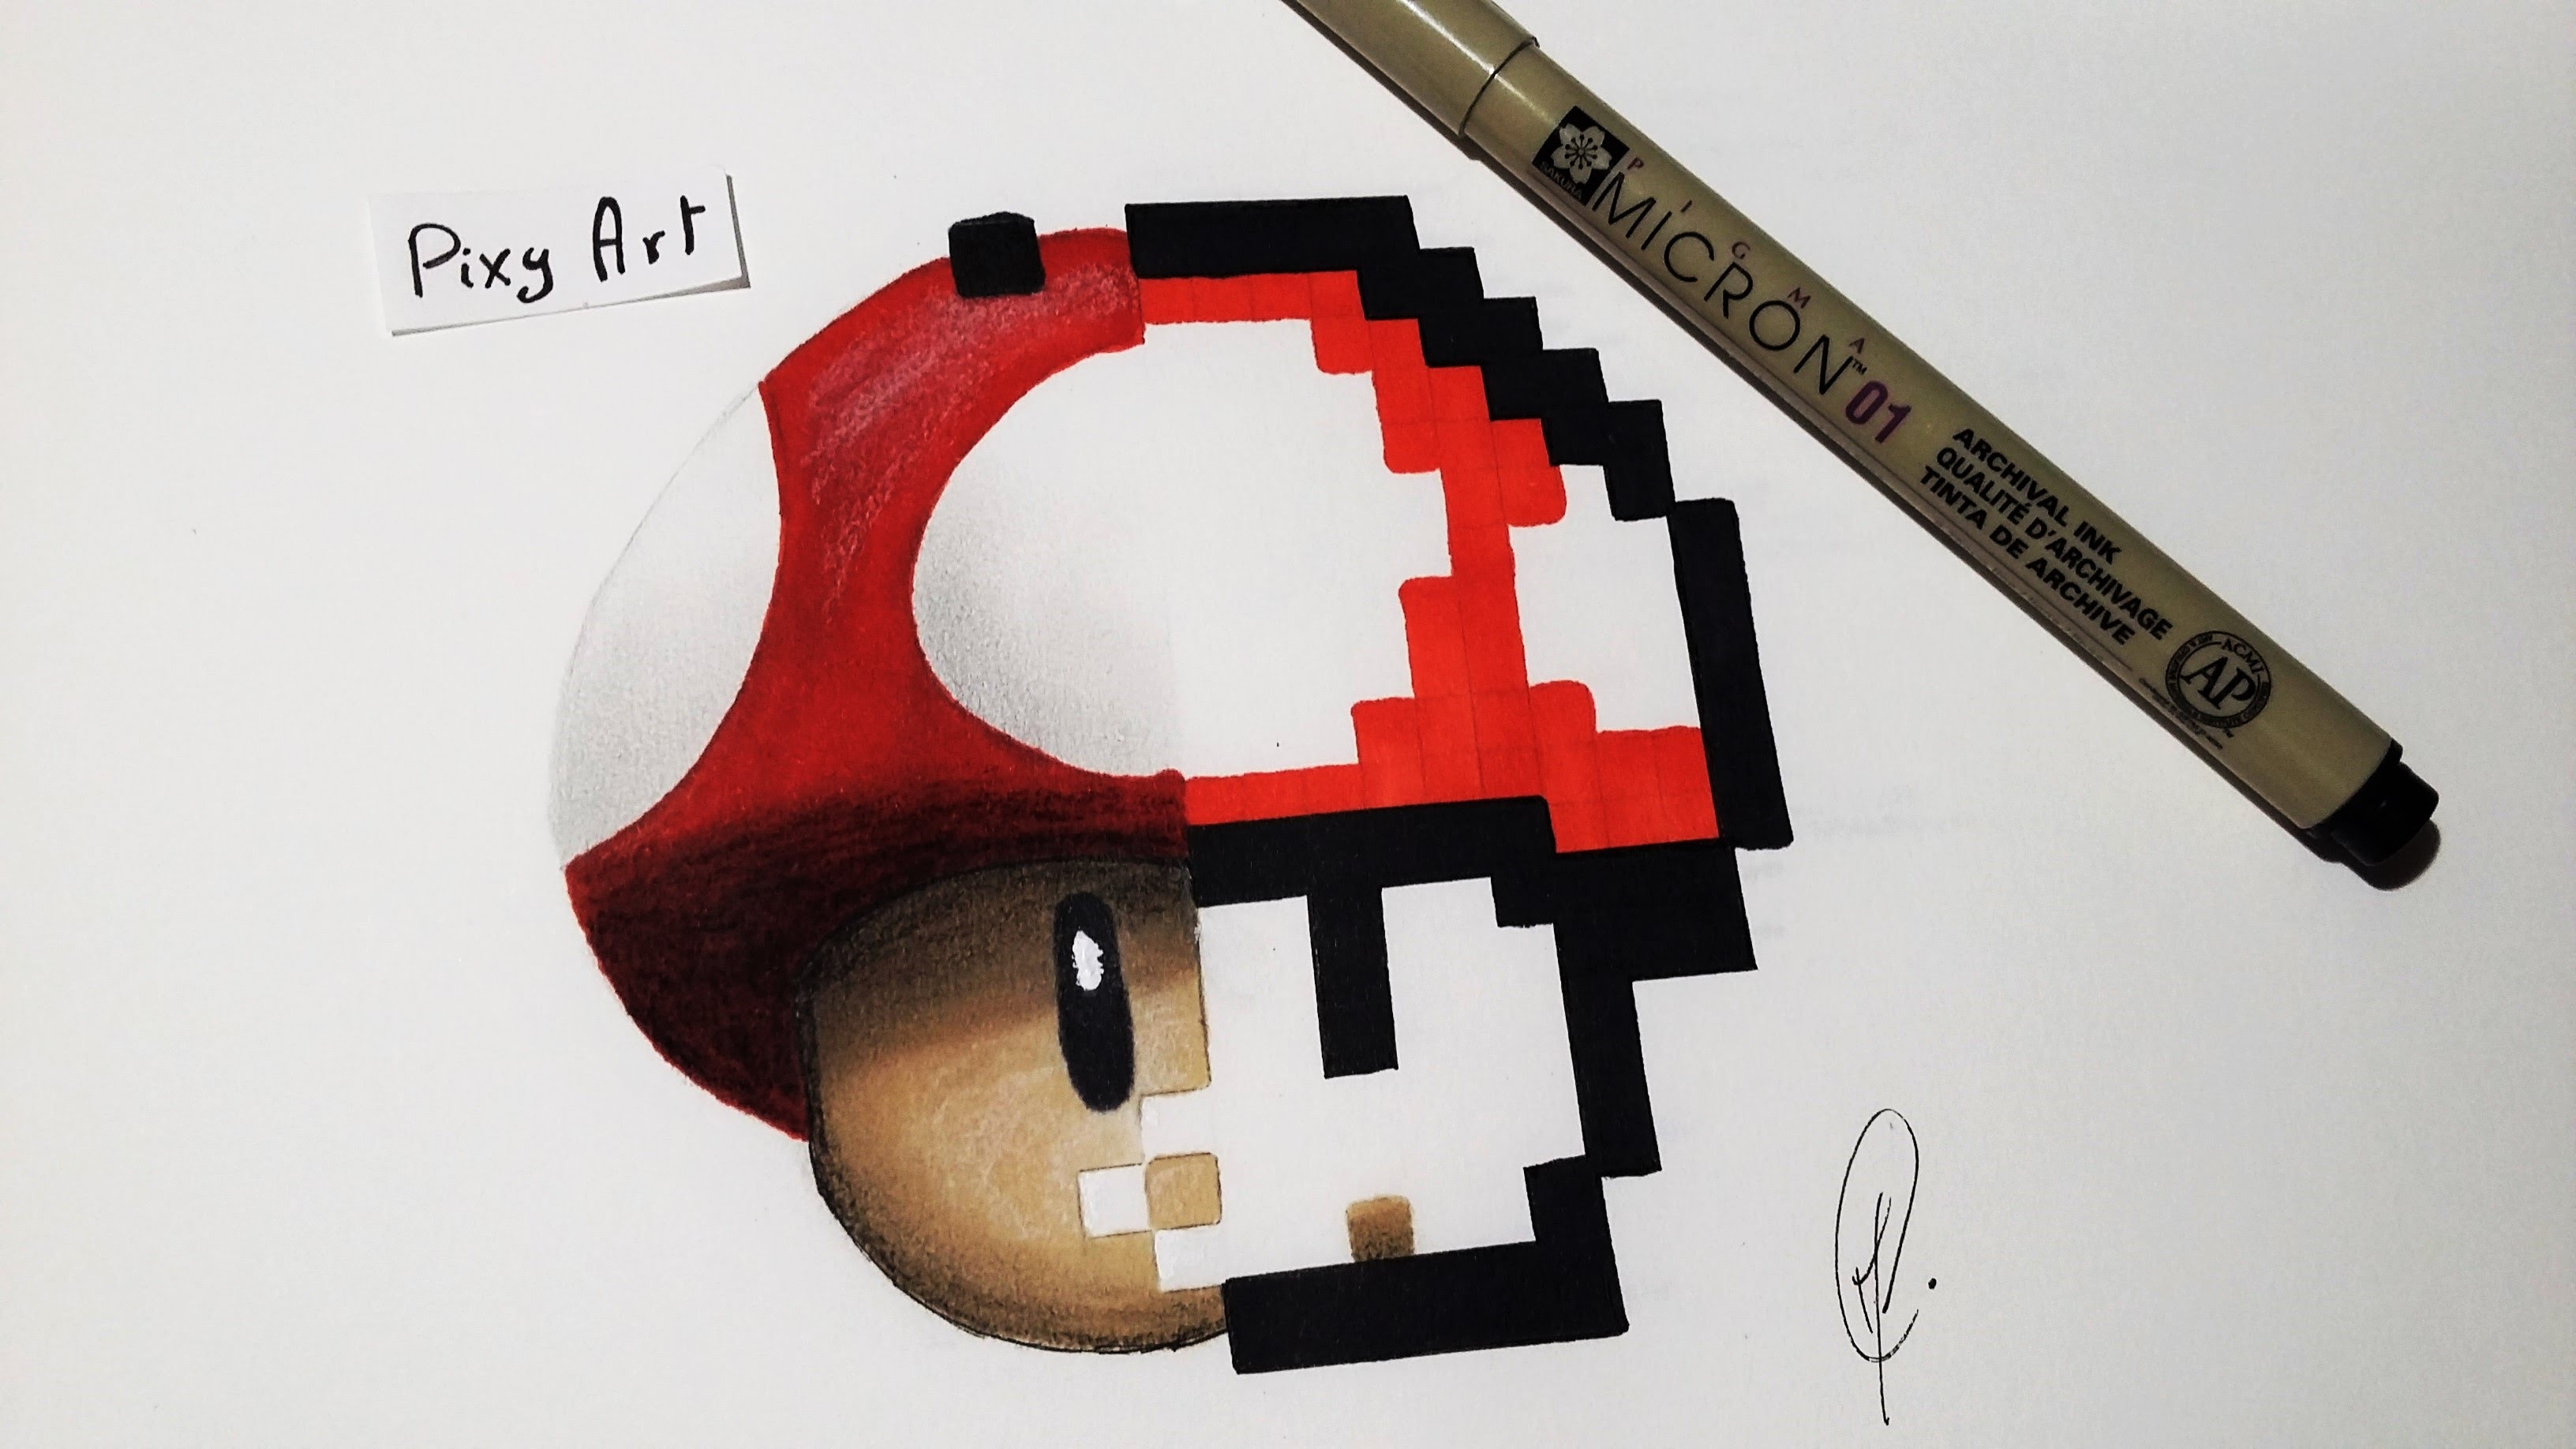 Drawn pixel art realistic Drawing Mario YouTube Mushroom by